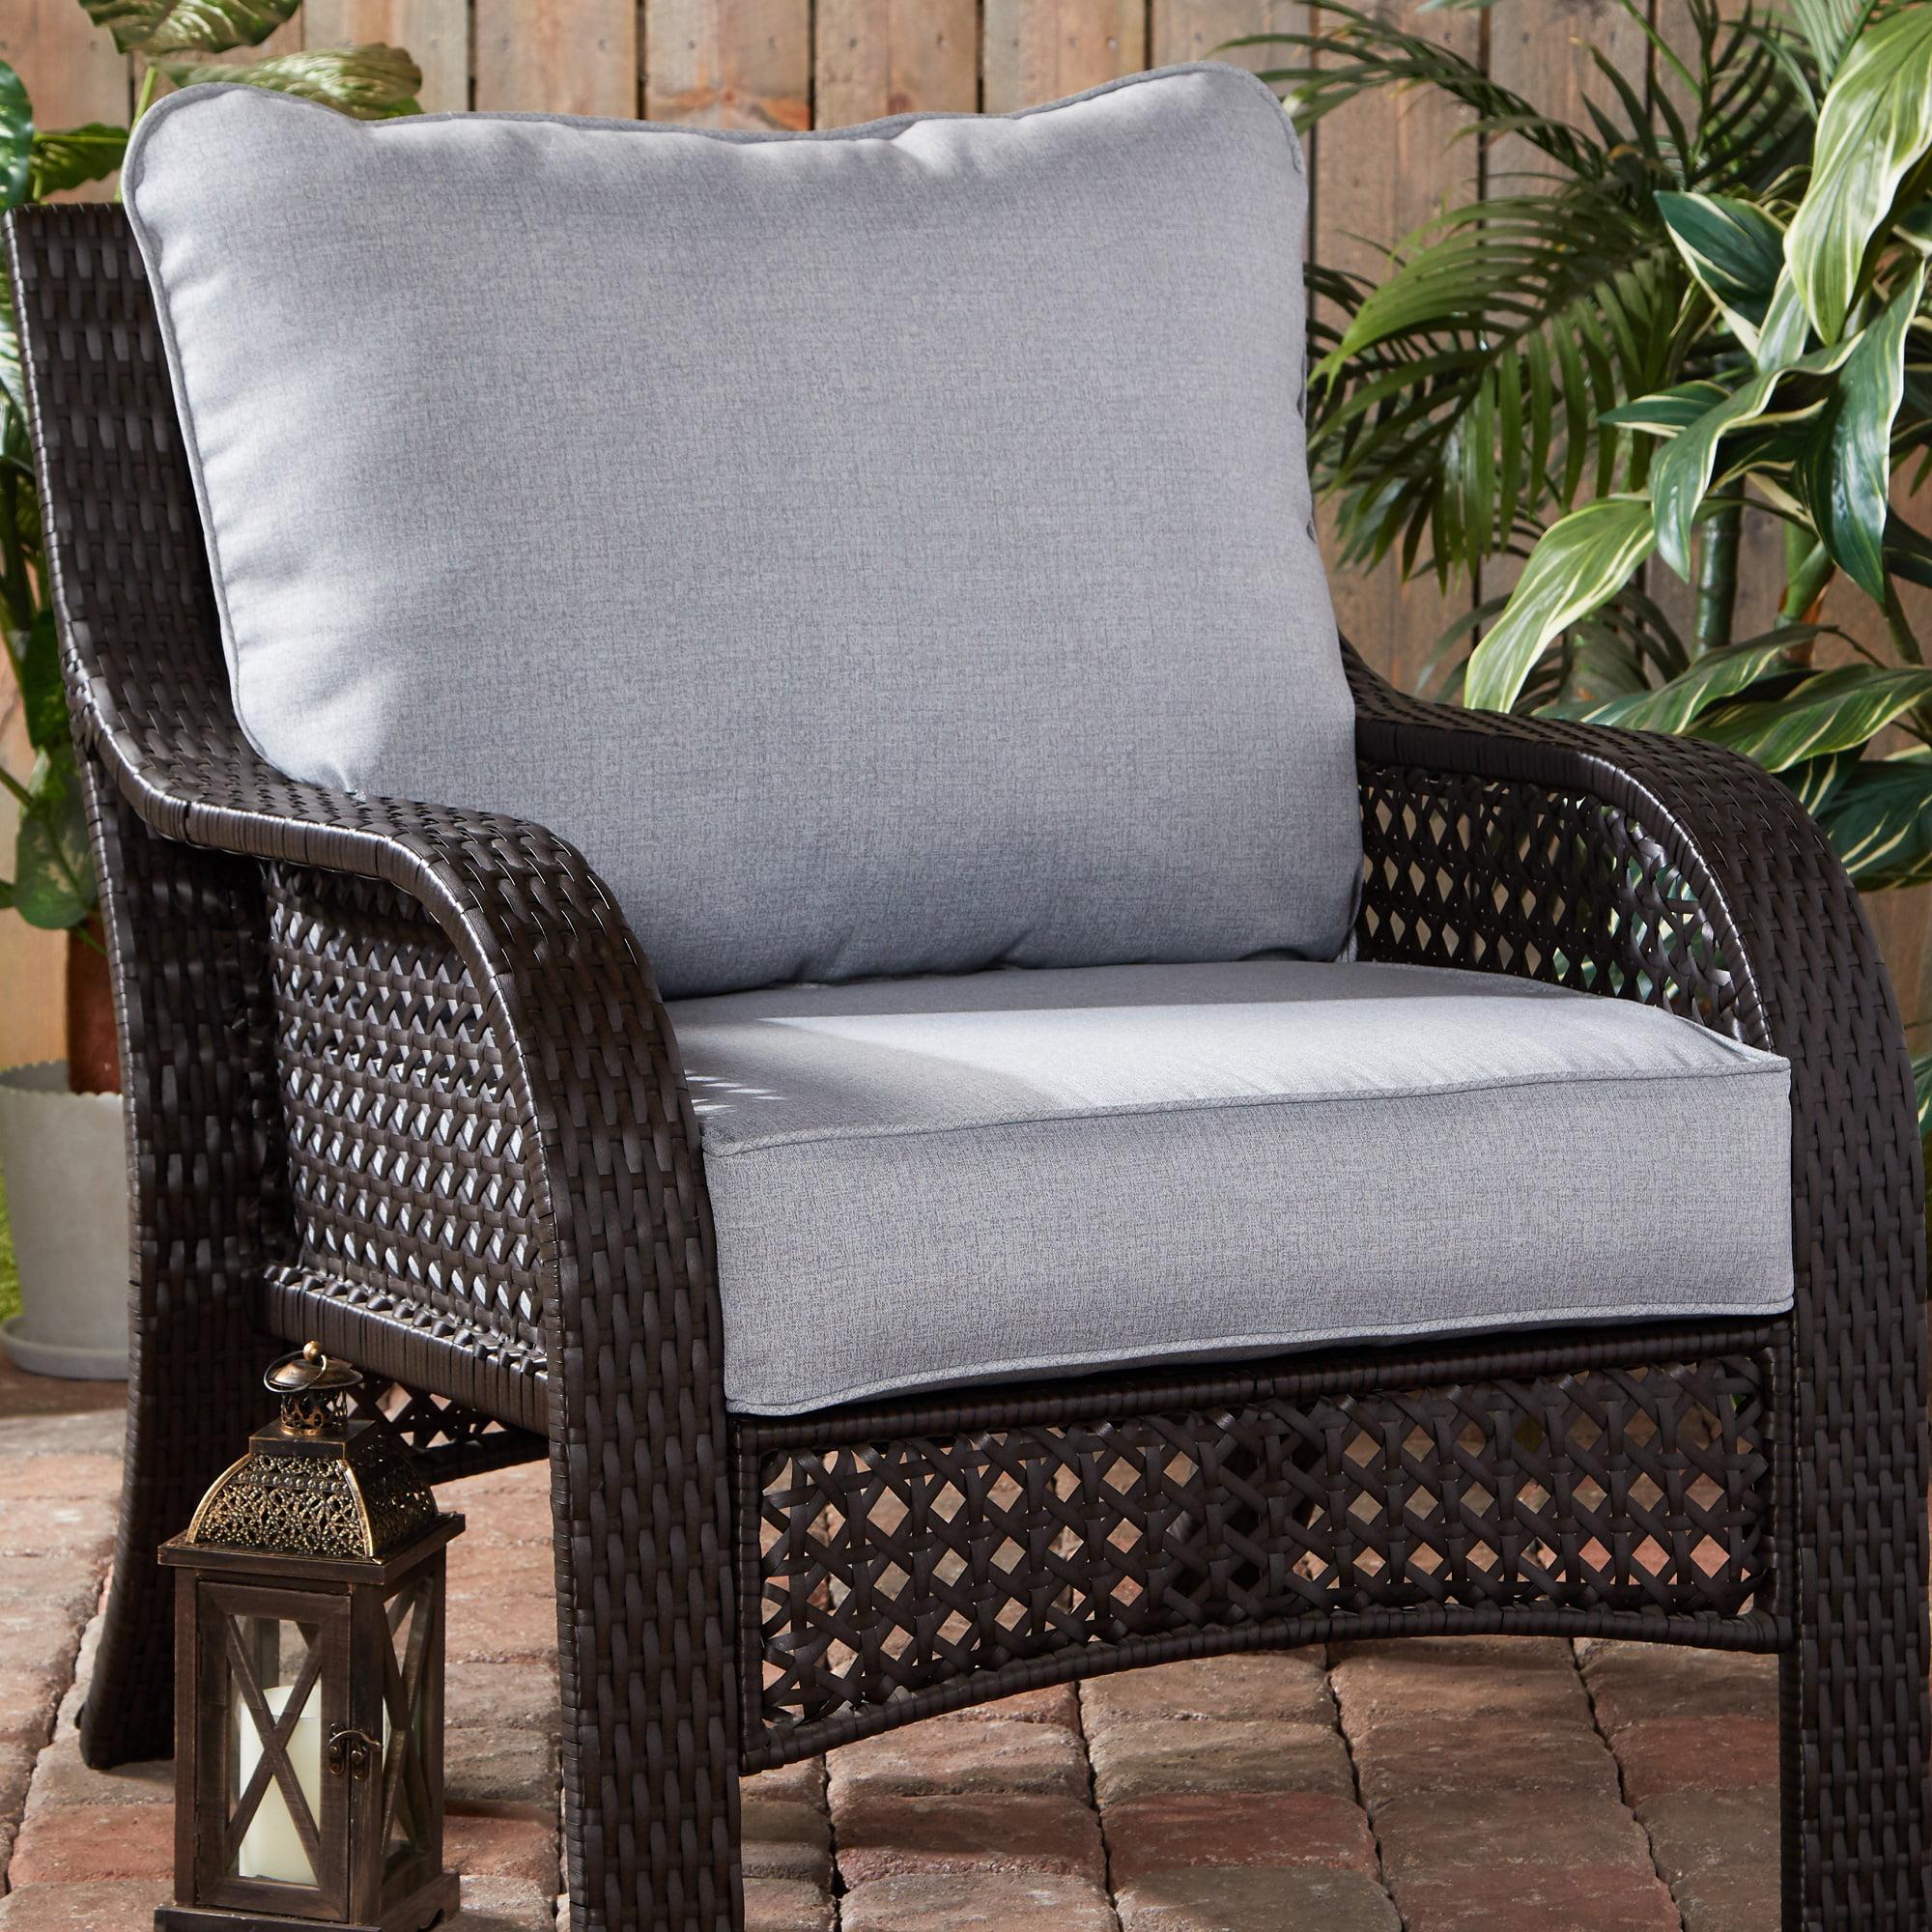 Heather Gray Outdoor 2 Pc Deep Seat Cushion Set Walmart Com Walmart Com